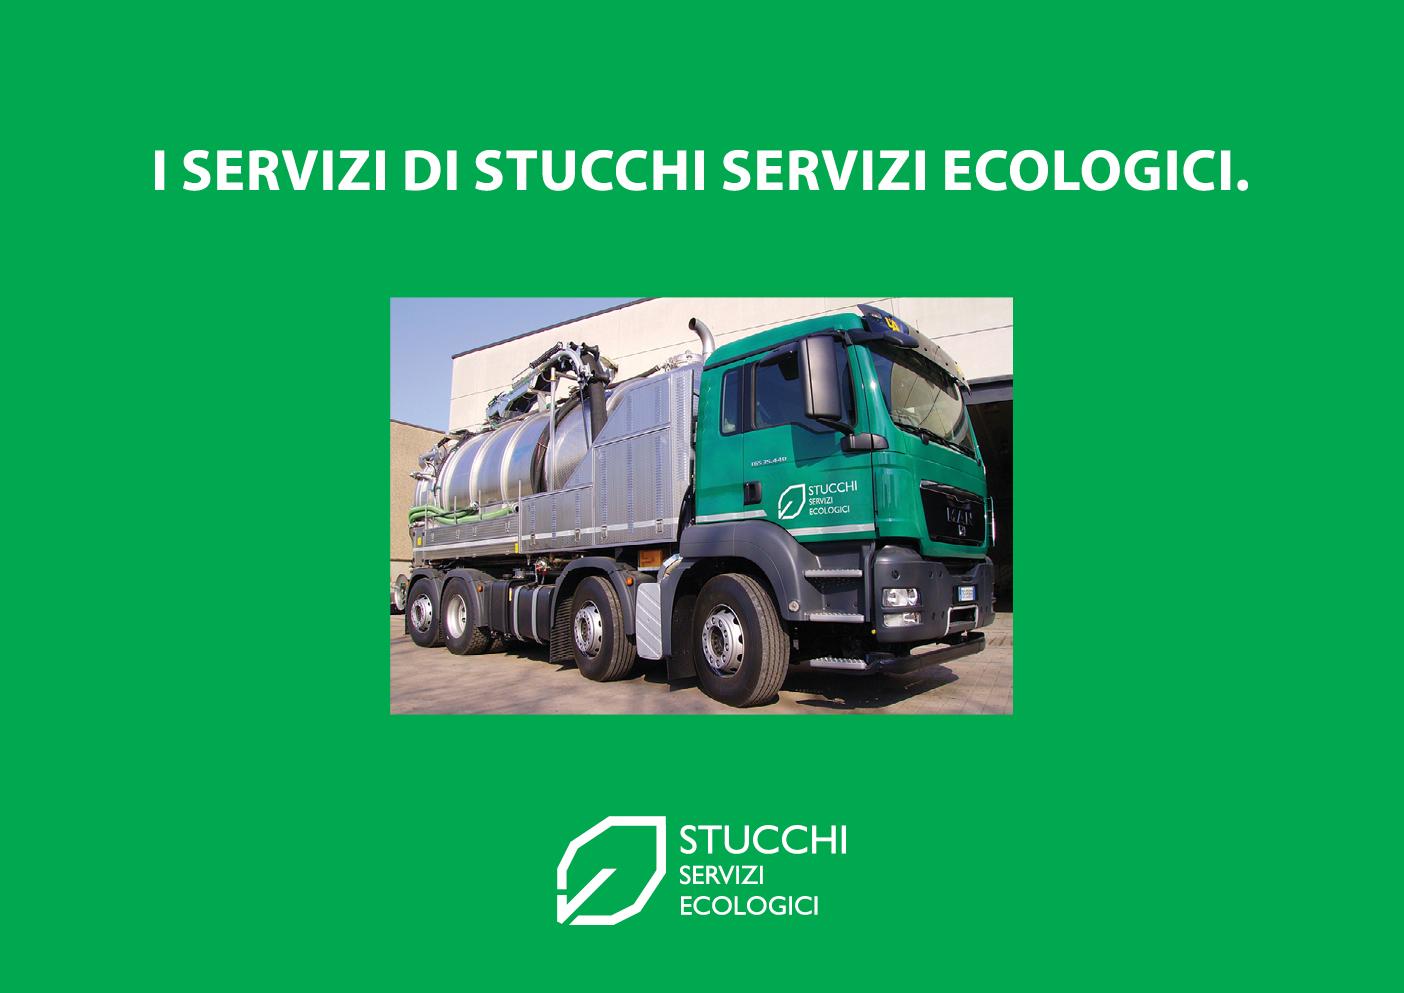 Servizi di Stucchi Servizi Ecologici